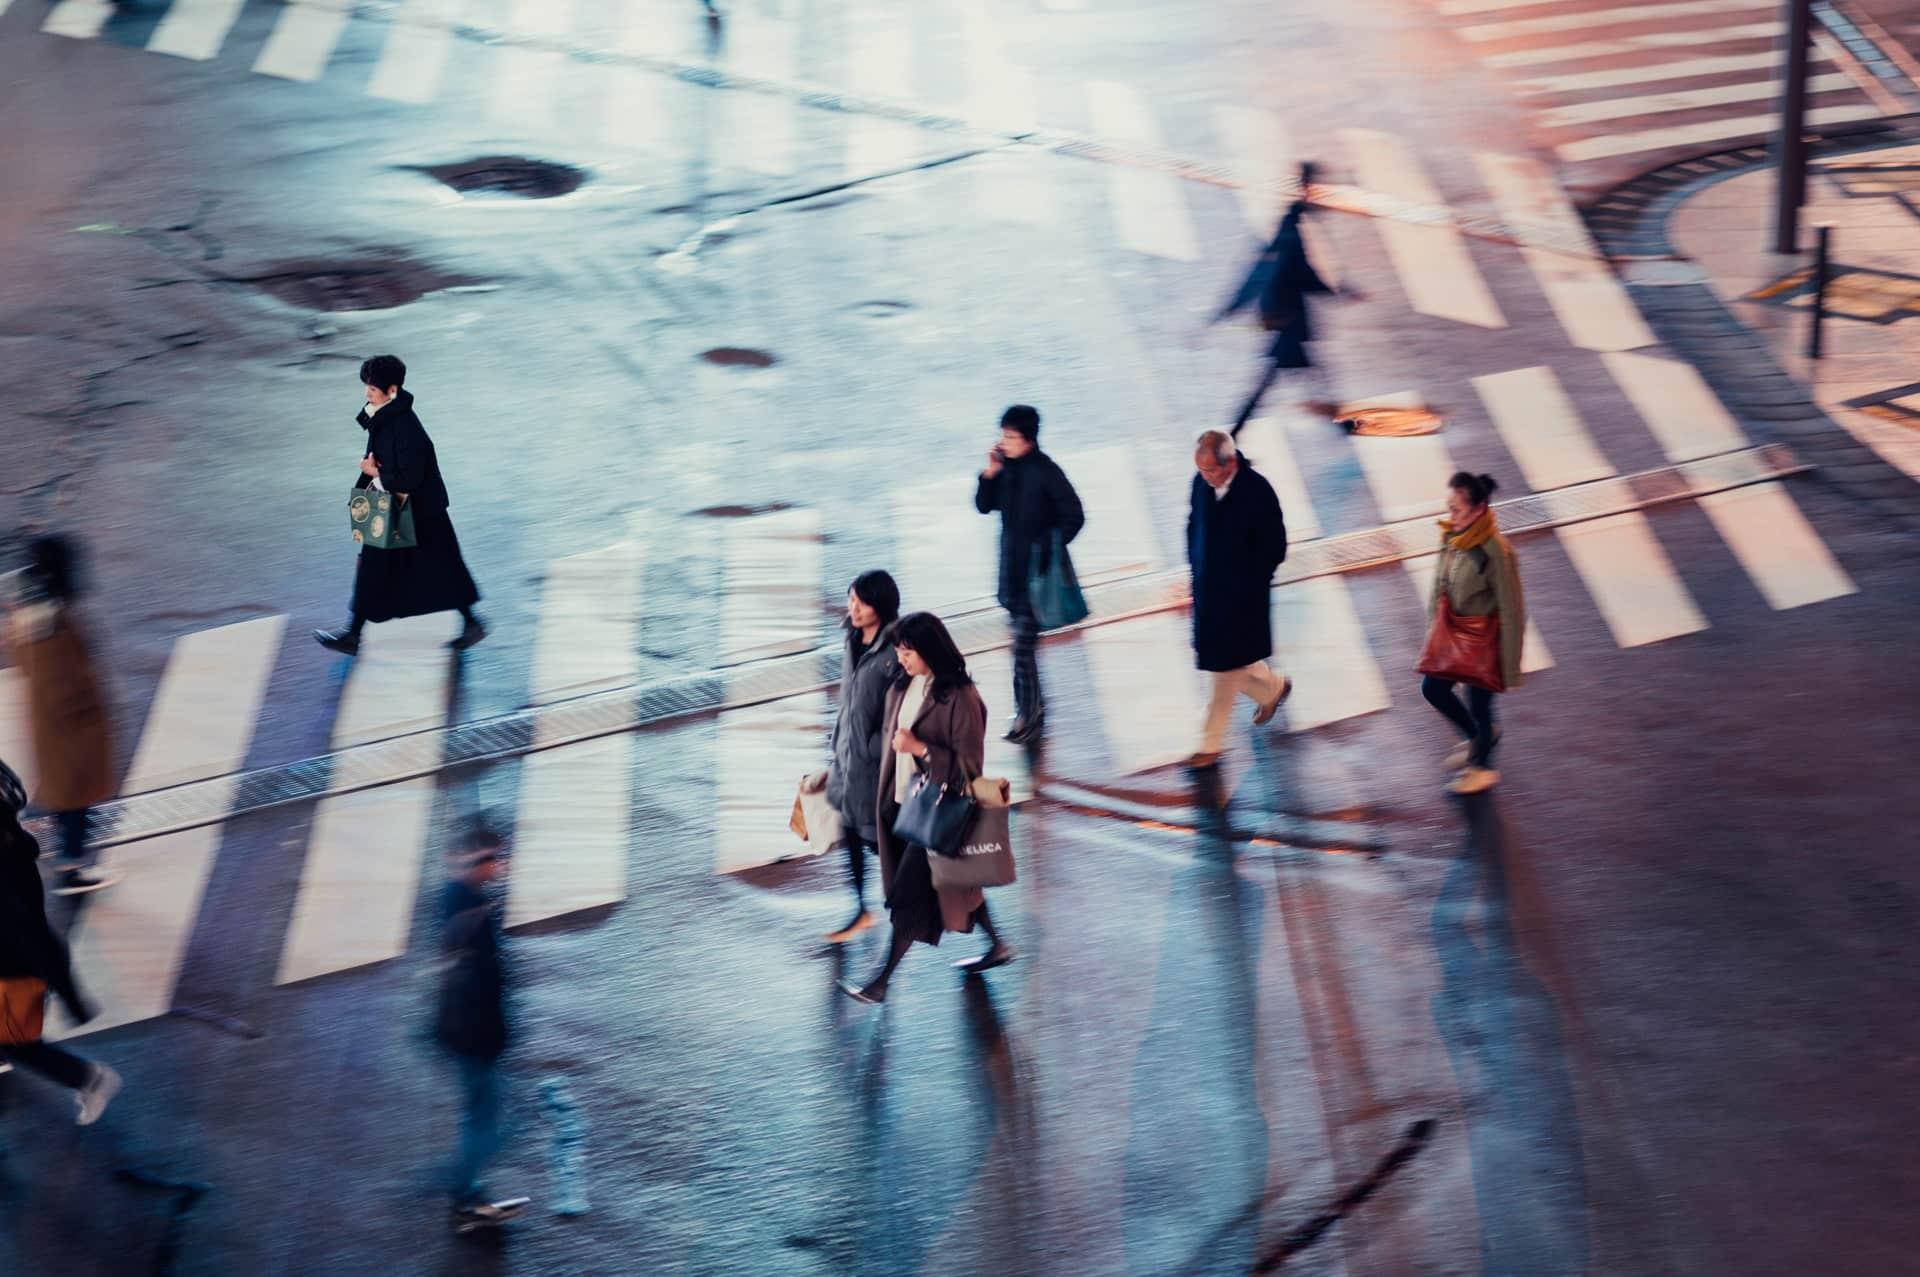 Pedestrians Right Of Way Header Image